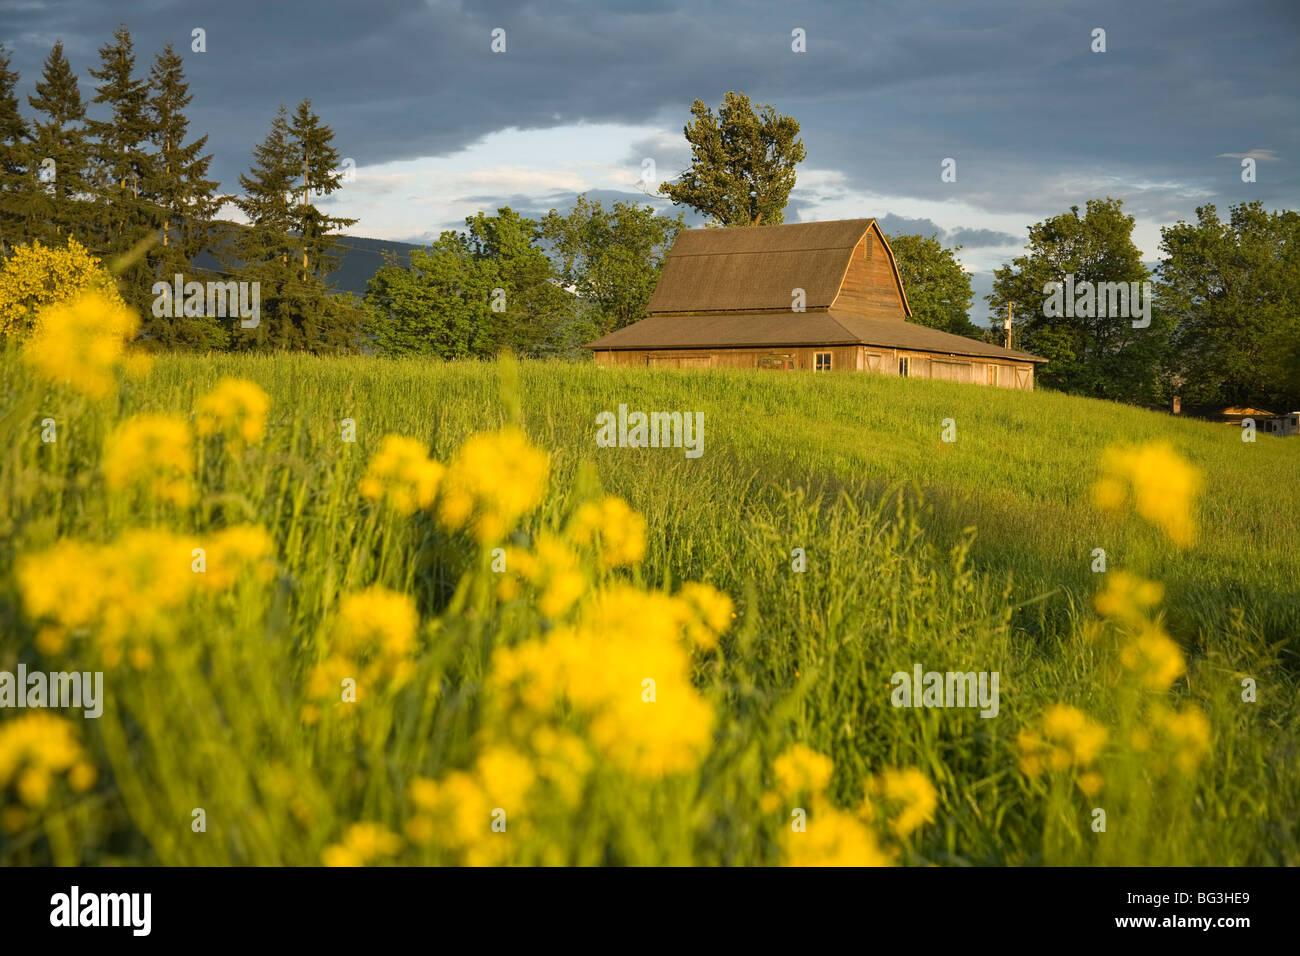 Barn, Sultan City, Stevens Pass Scenic Highway, Washington State, United States of America, North America - Stock Image